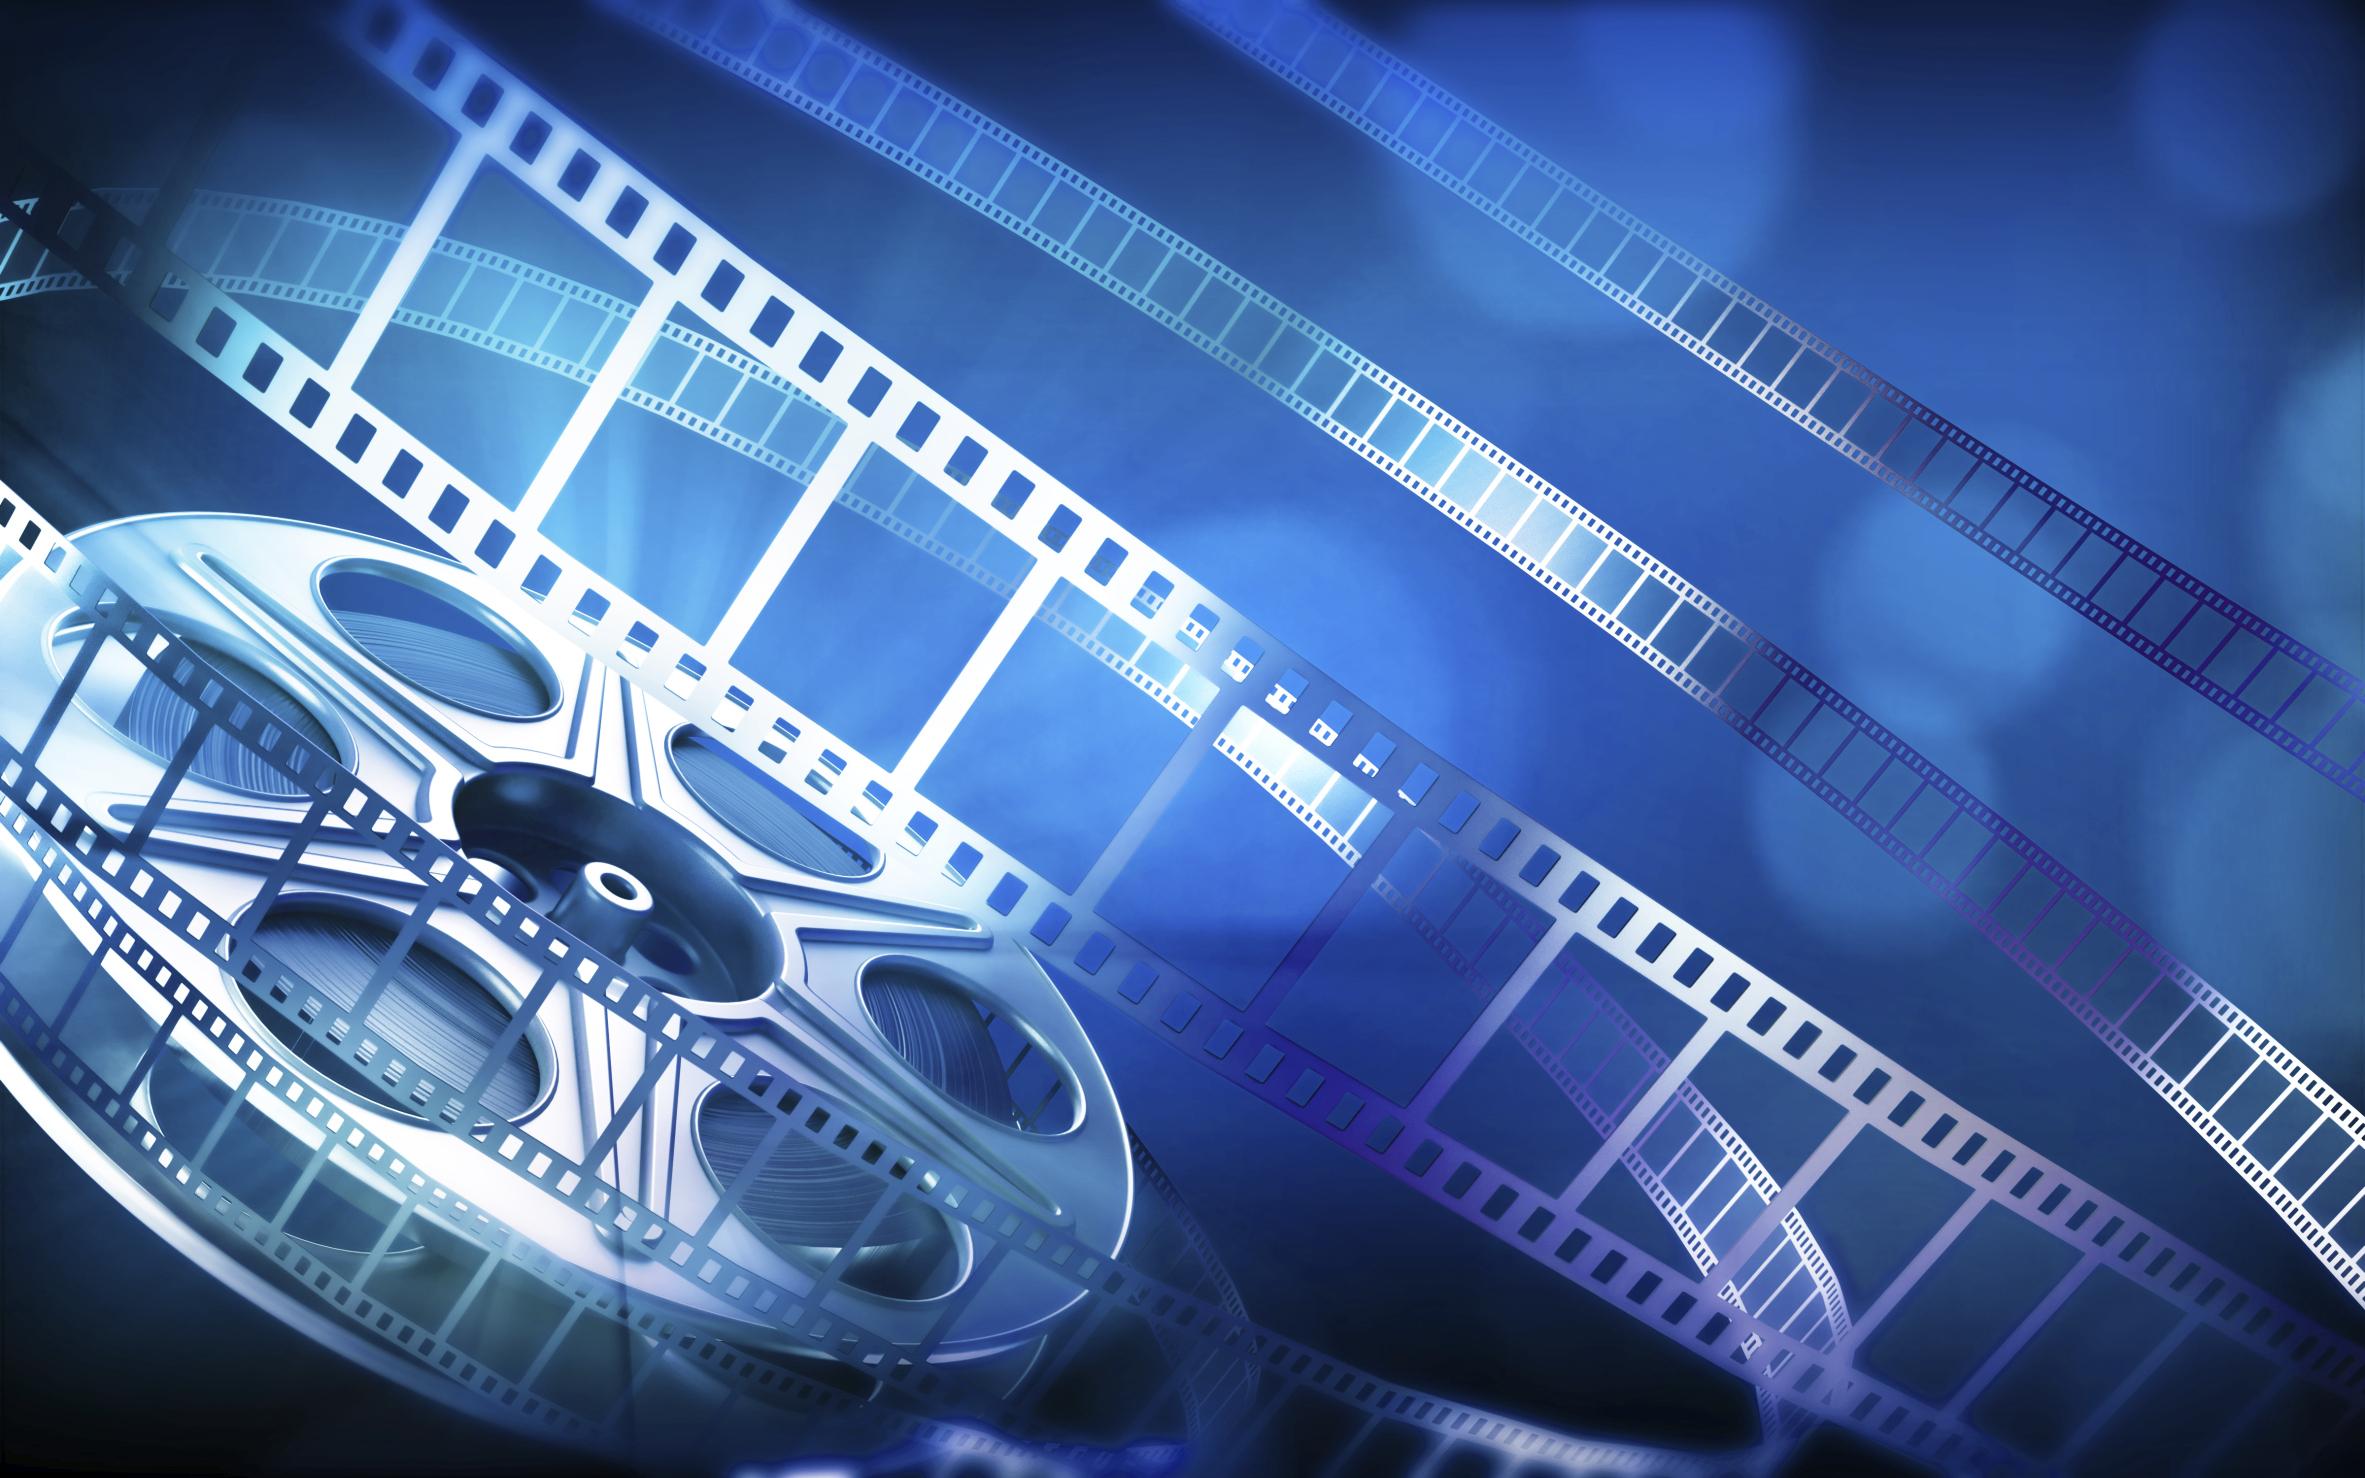 Cinema film reel 2365x1478